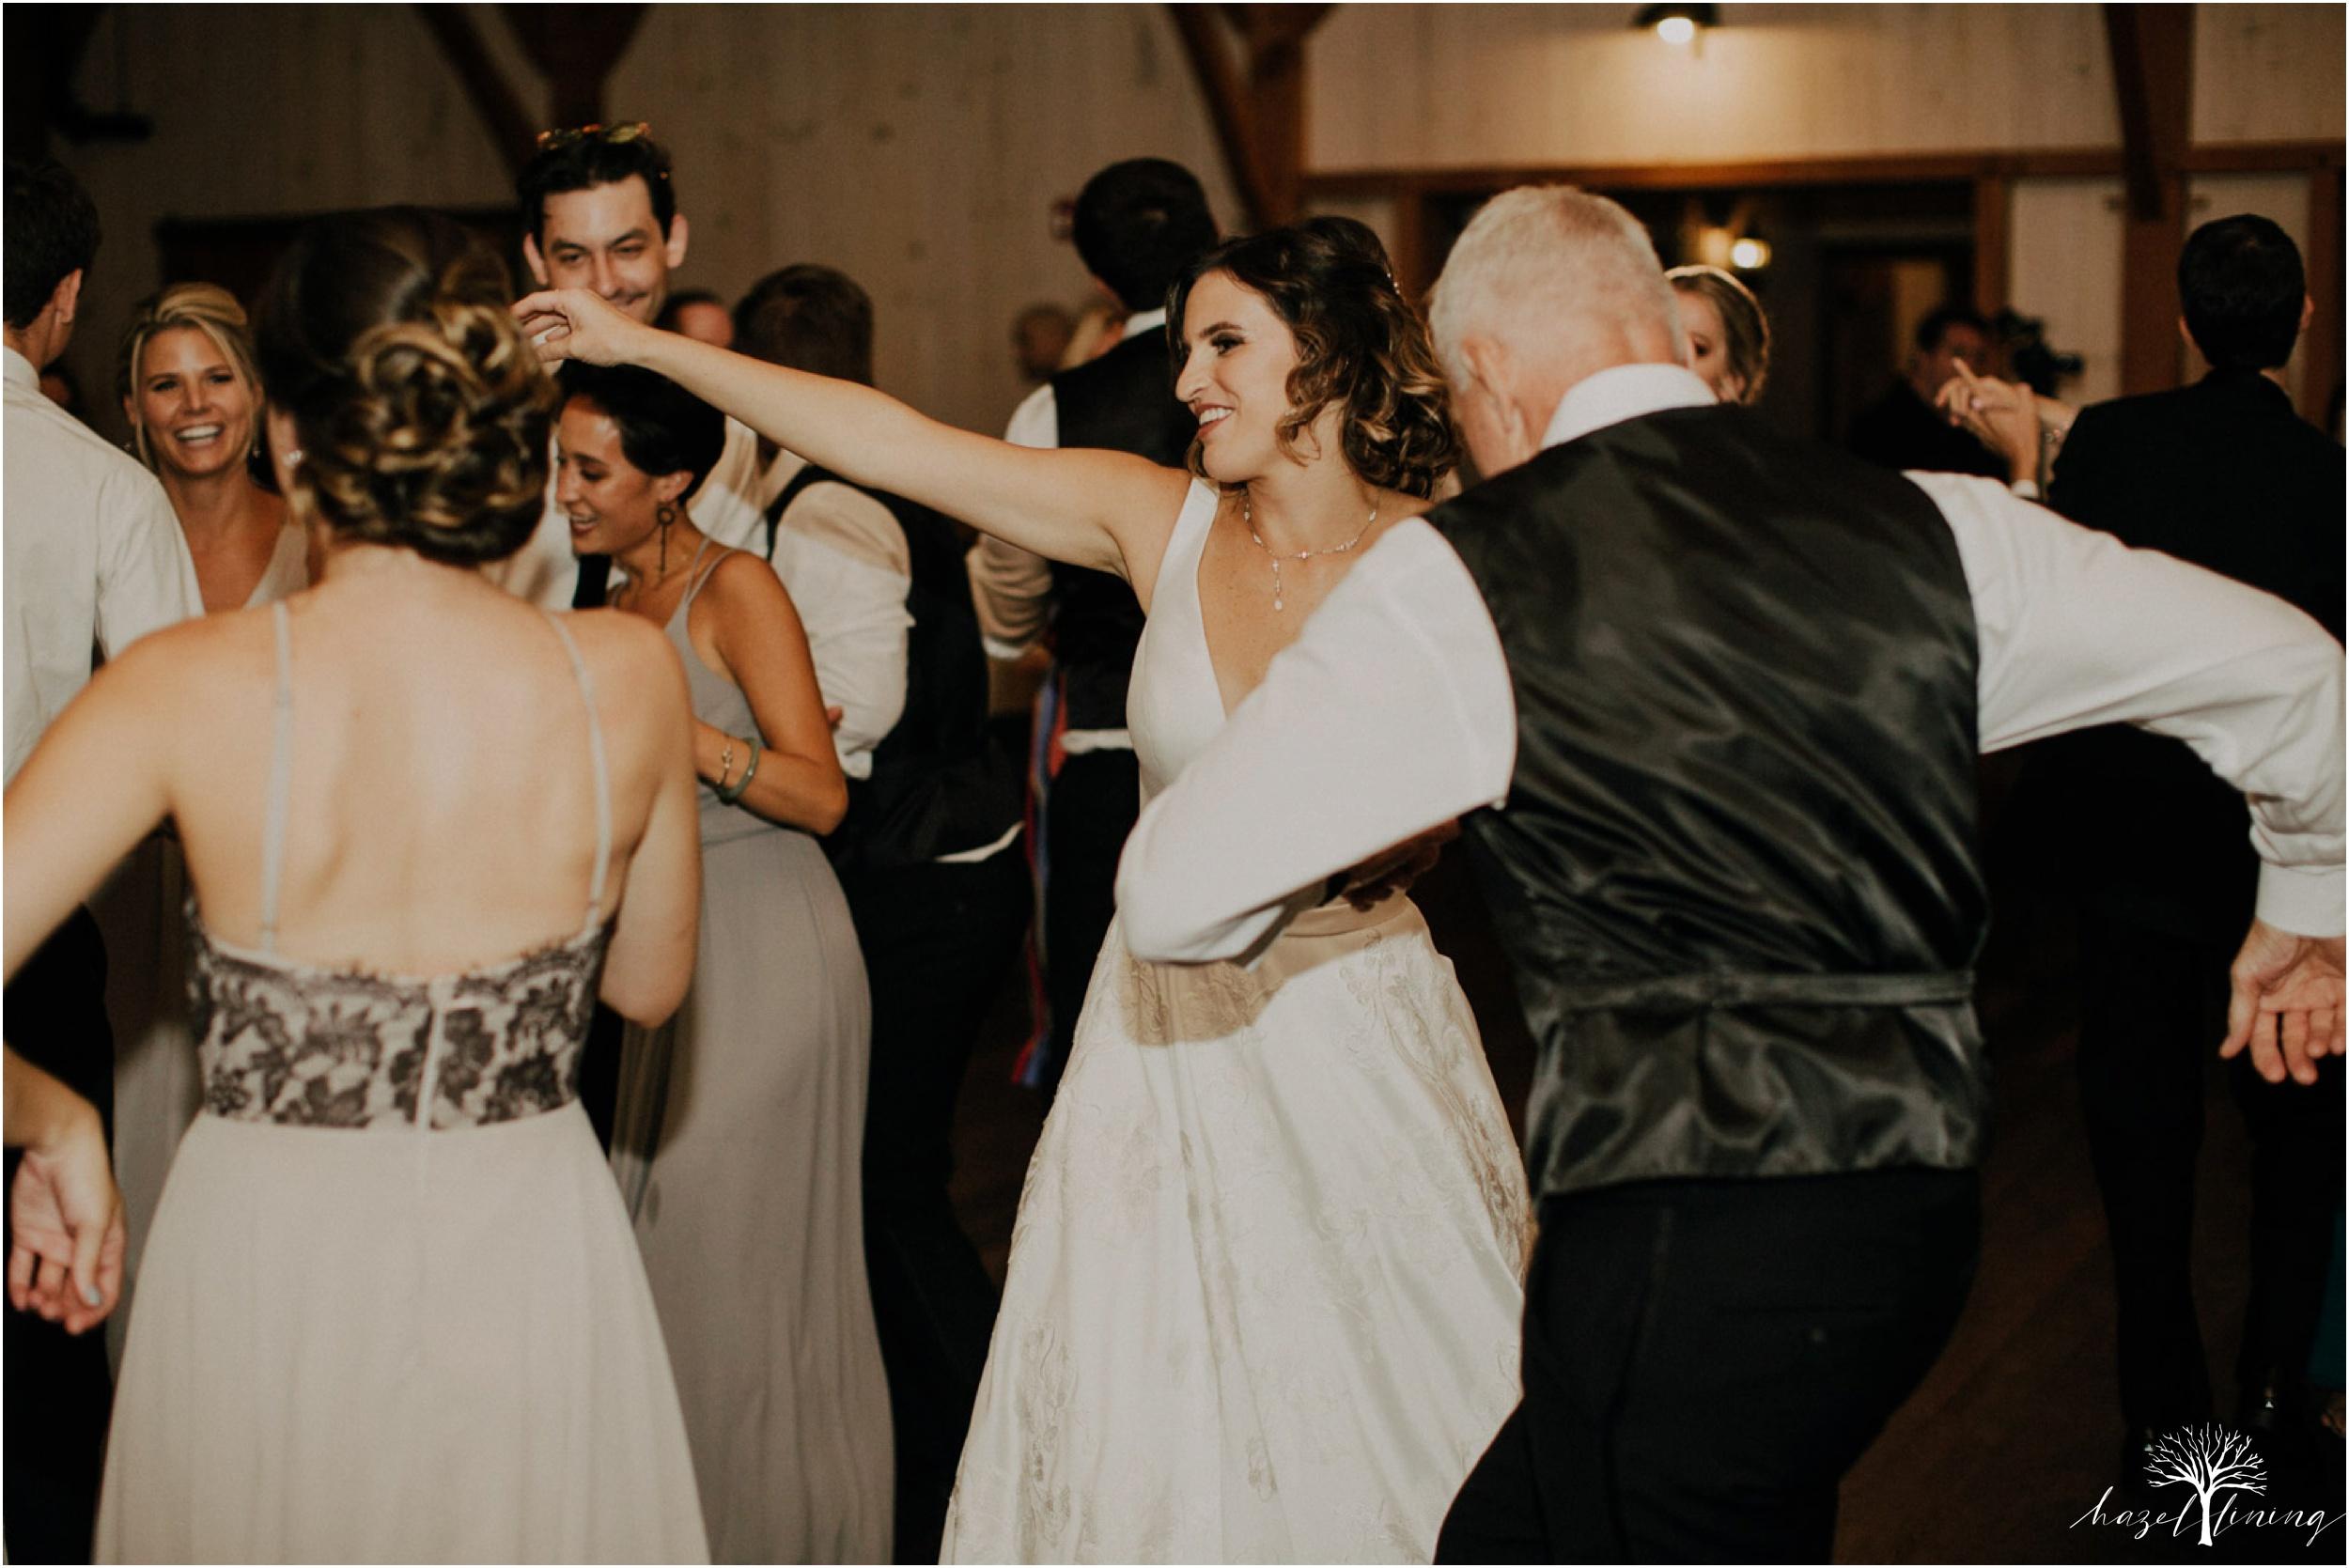 maureen-hepner-anthony-giordano-rose-bank-winery-newtow-pennsylvania-luxury-summer-wedding-hazel-lining-photography-destination-elopement-wedding-engagement-photography_0146.jpg